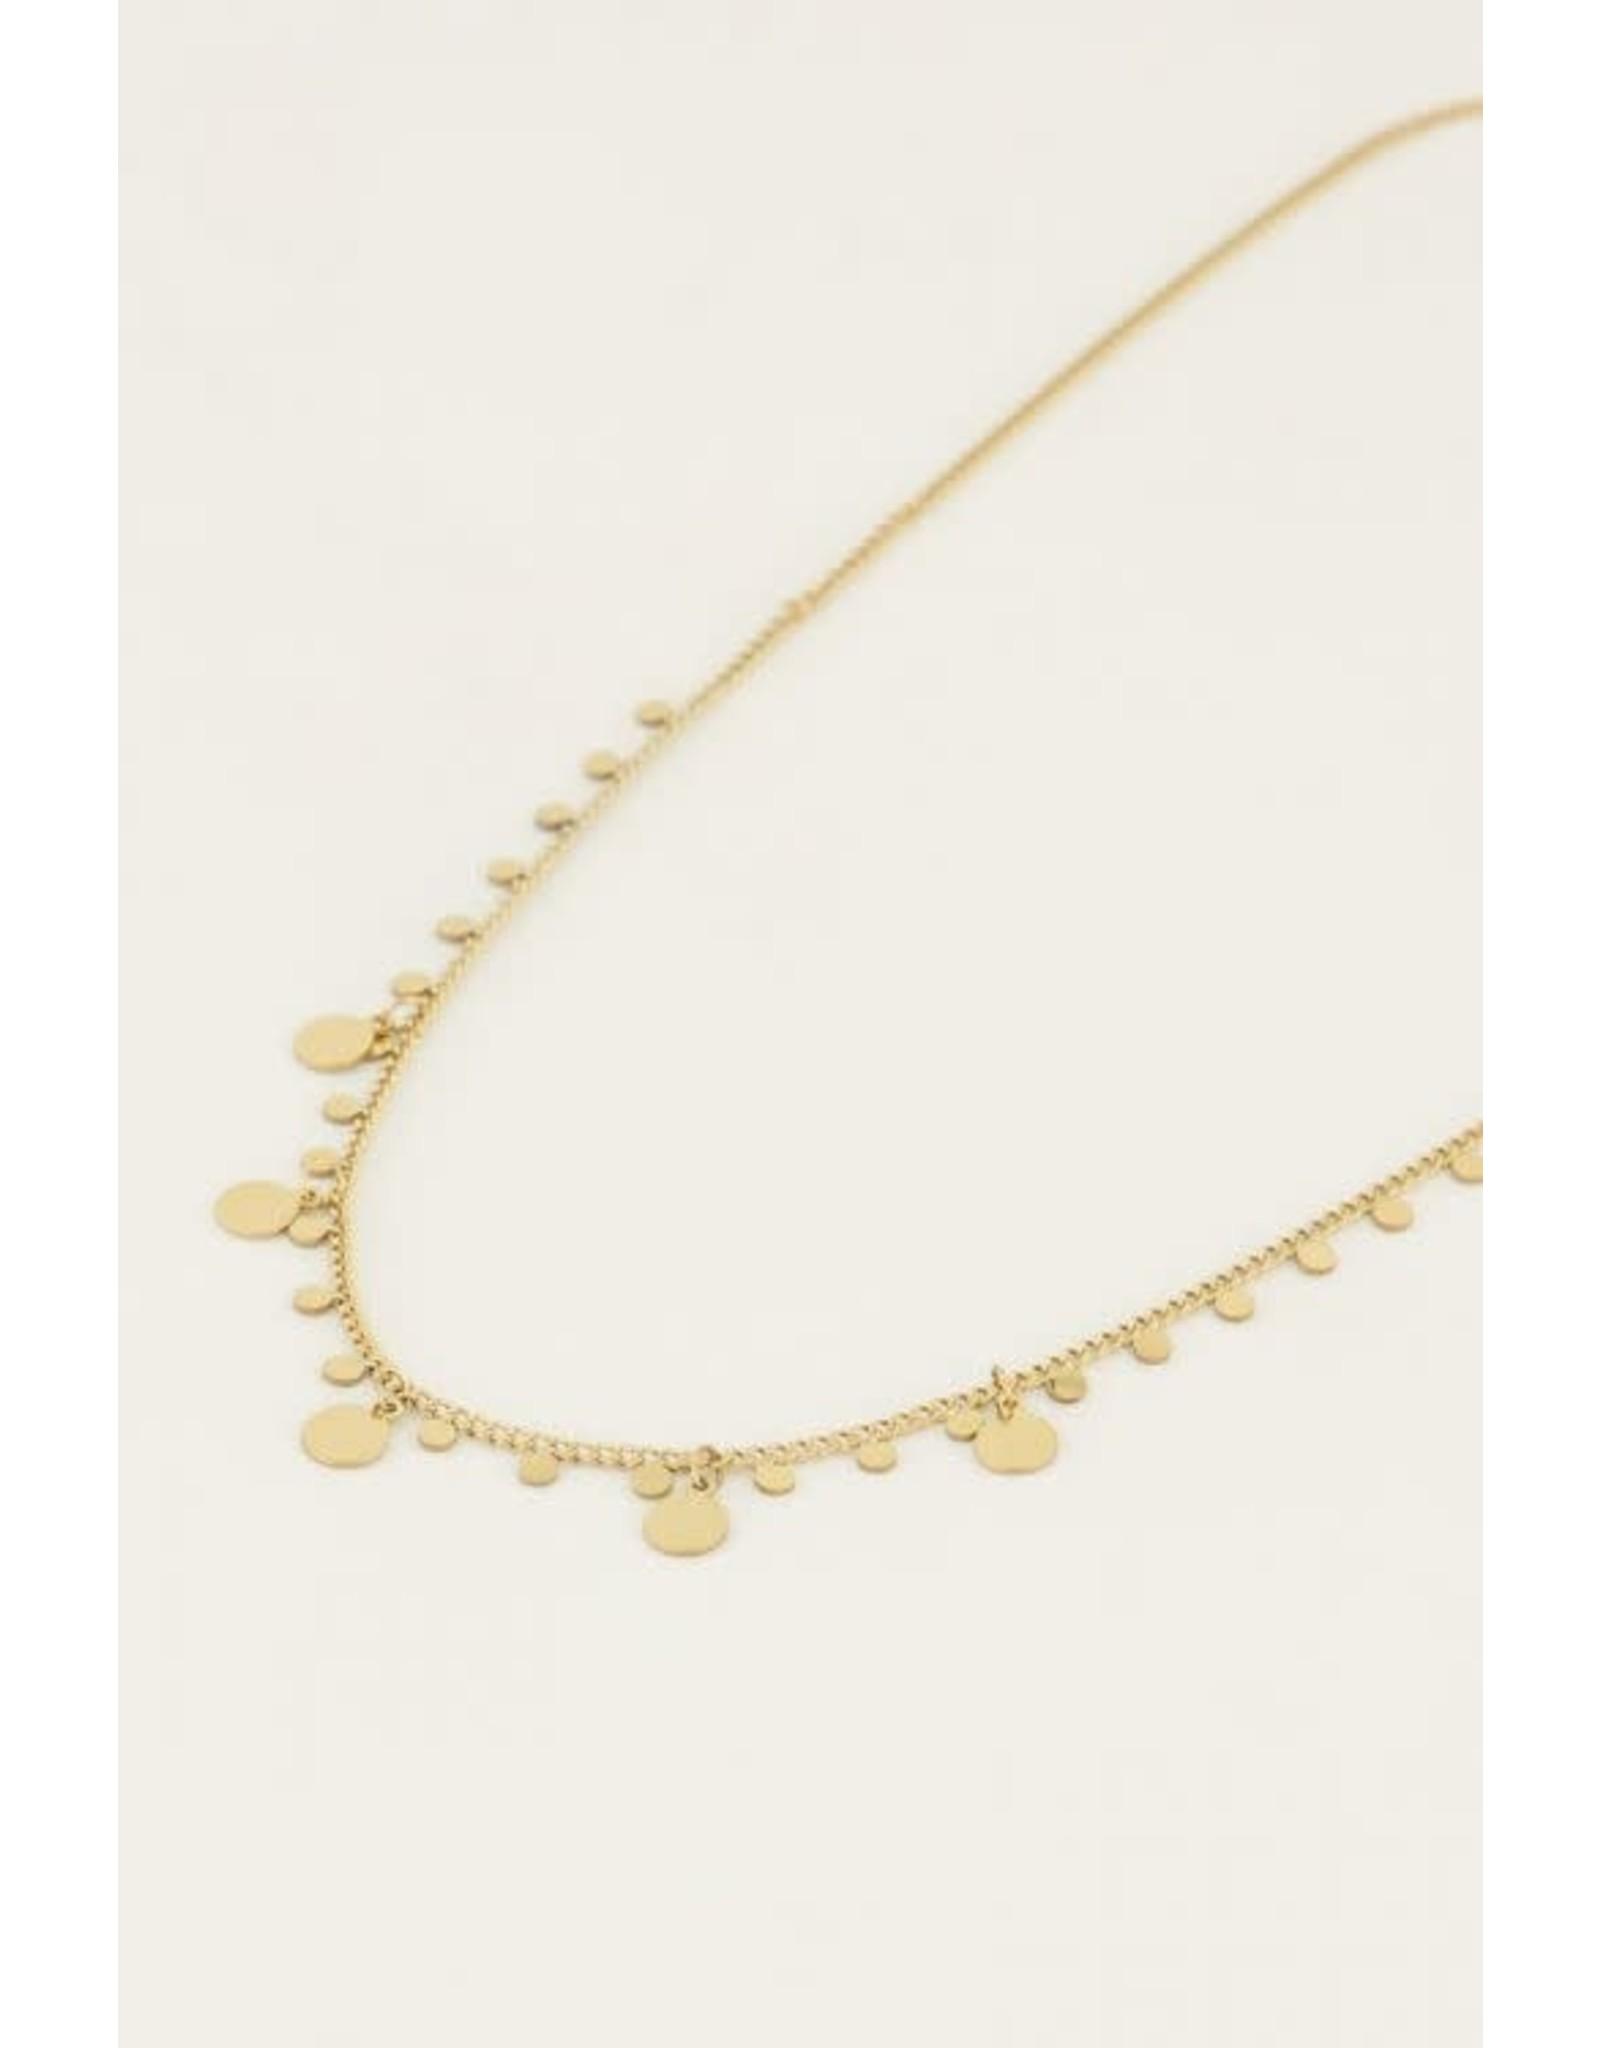 My Jewellery My Jewellery ketting ronde bedels